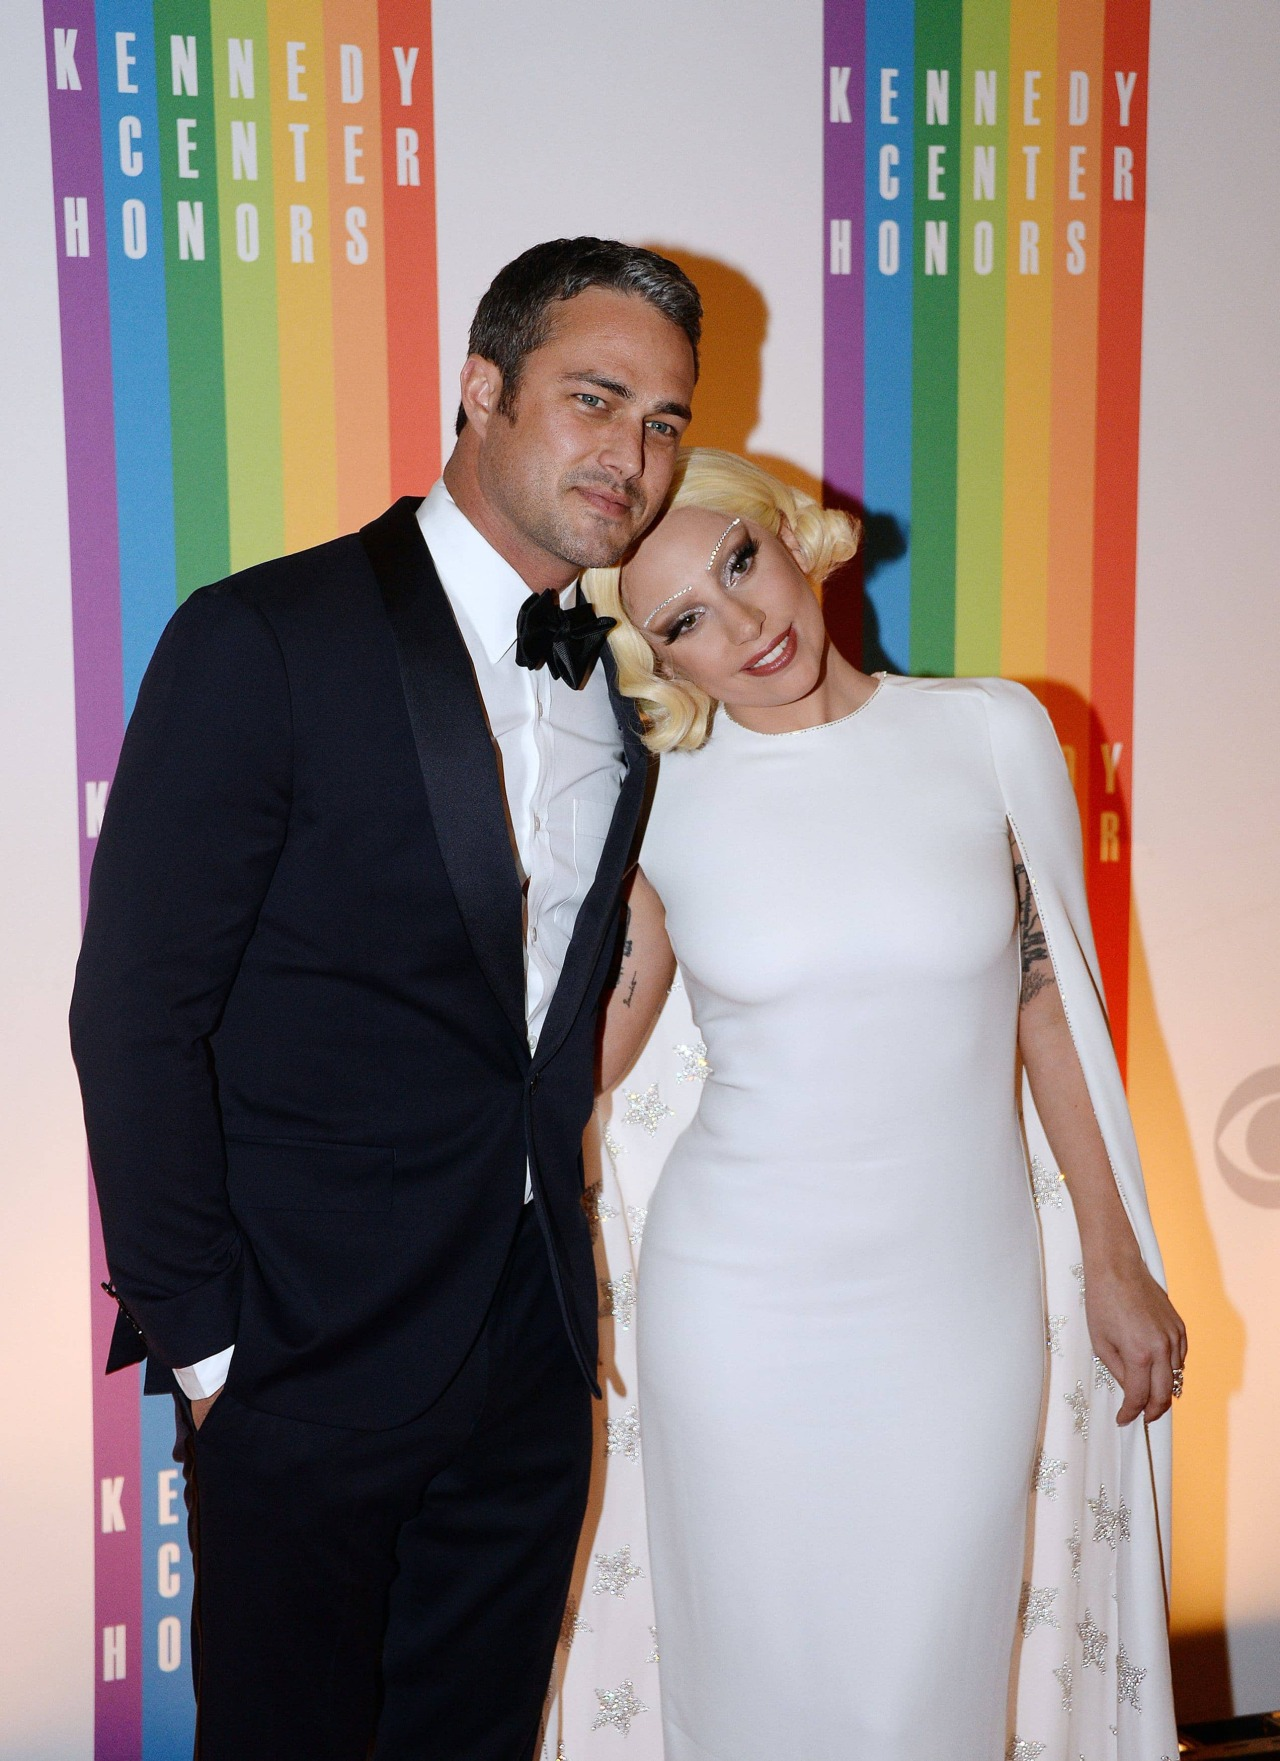 Lady Gaga and Taylor Kinney. - Page 2 Tumblr_ng9ie4VyYg1rz7rr7o6_1280